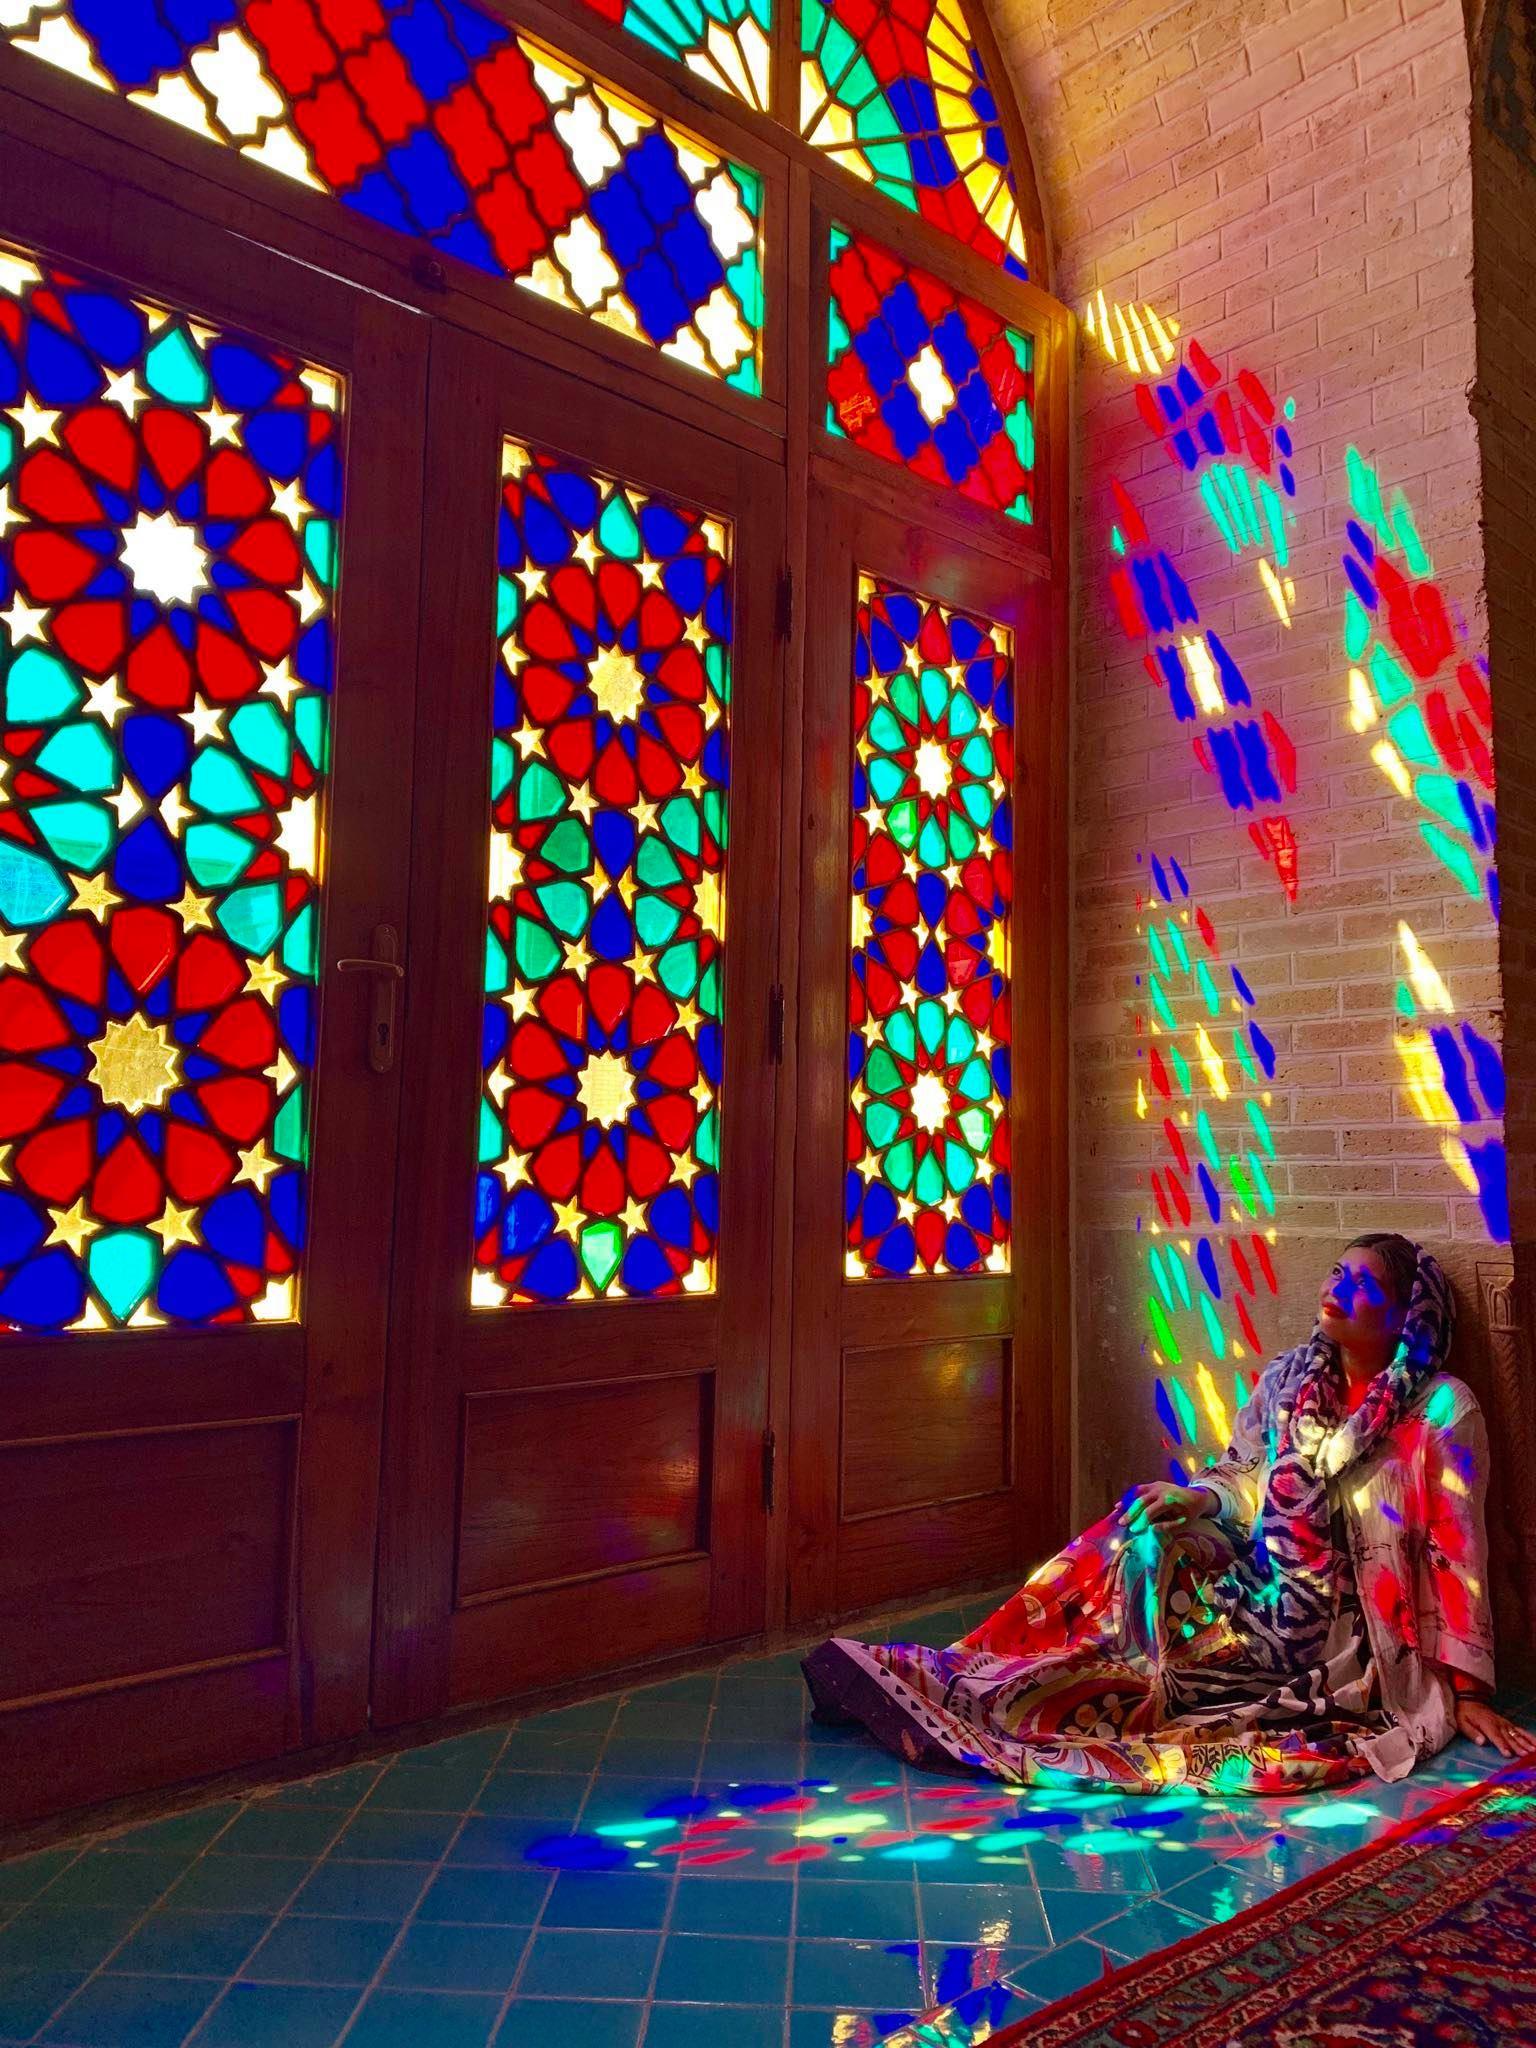 Kach Solo Travels in 2019 Good morning from SHIRAZ, IRAN2.jpg